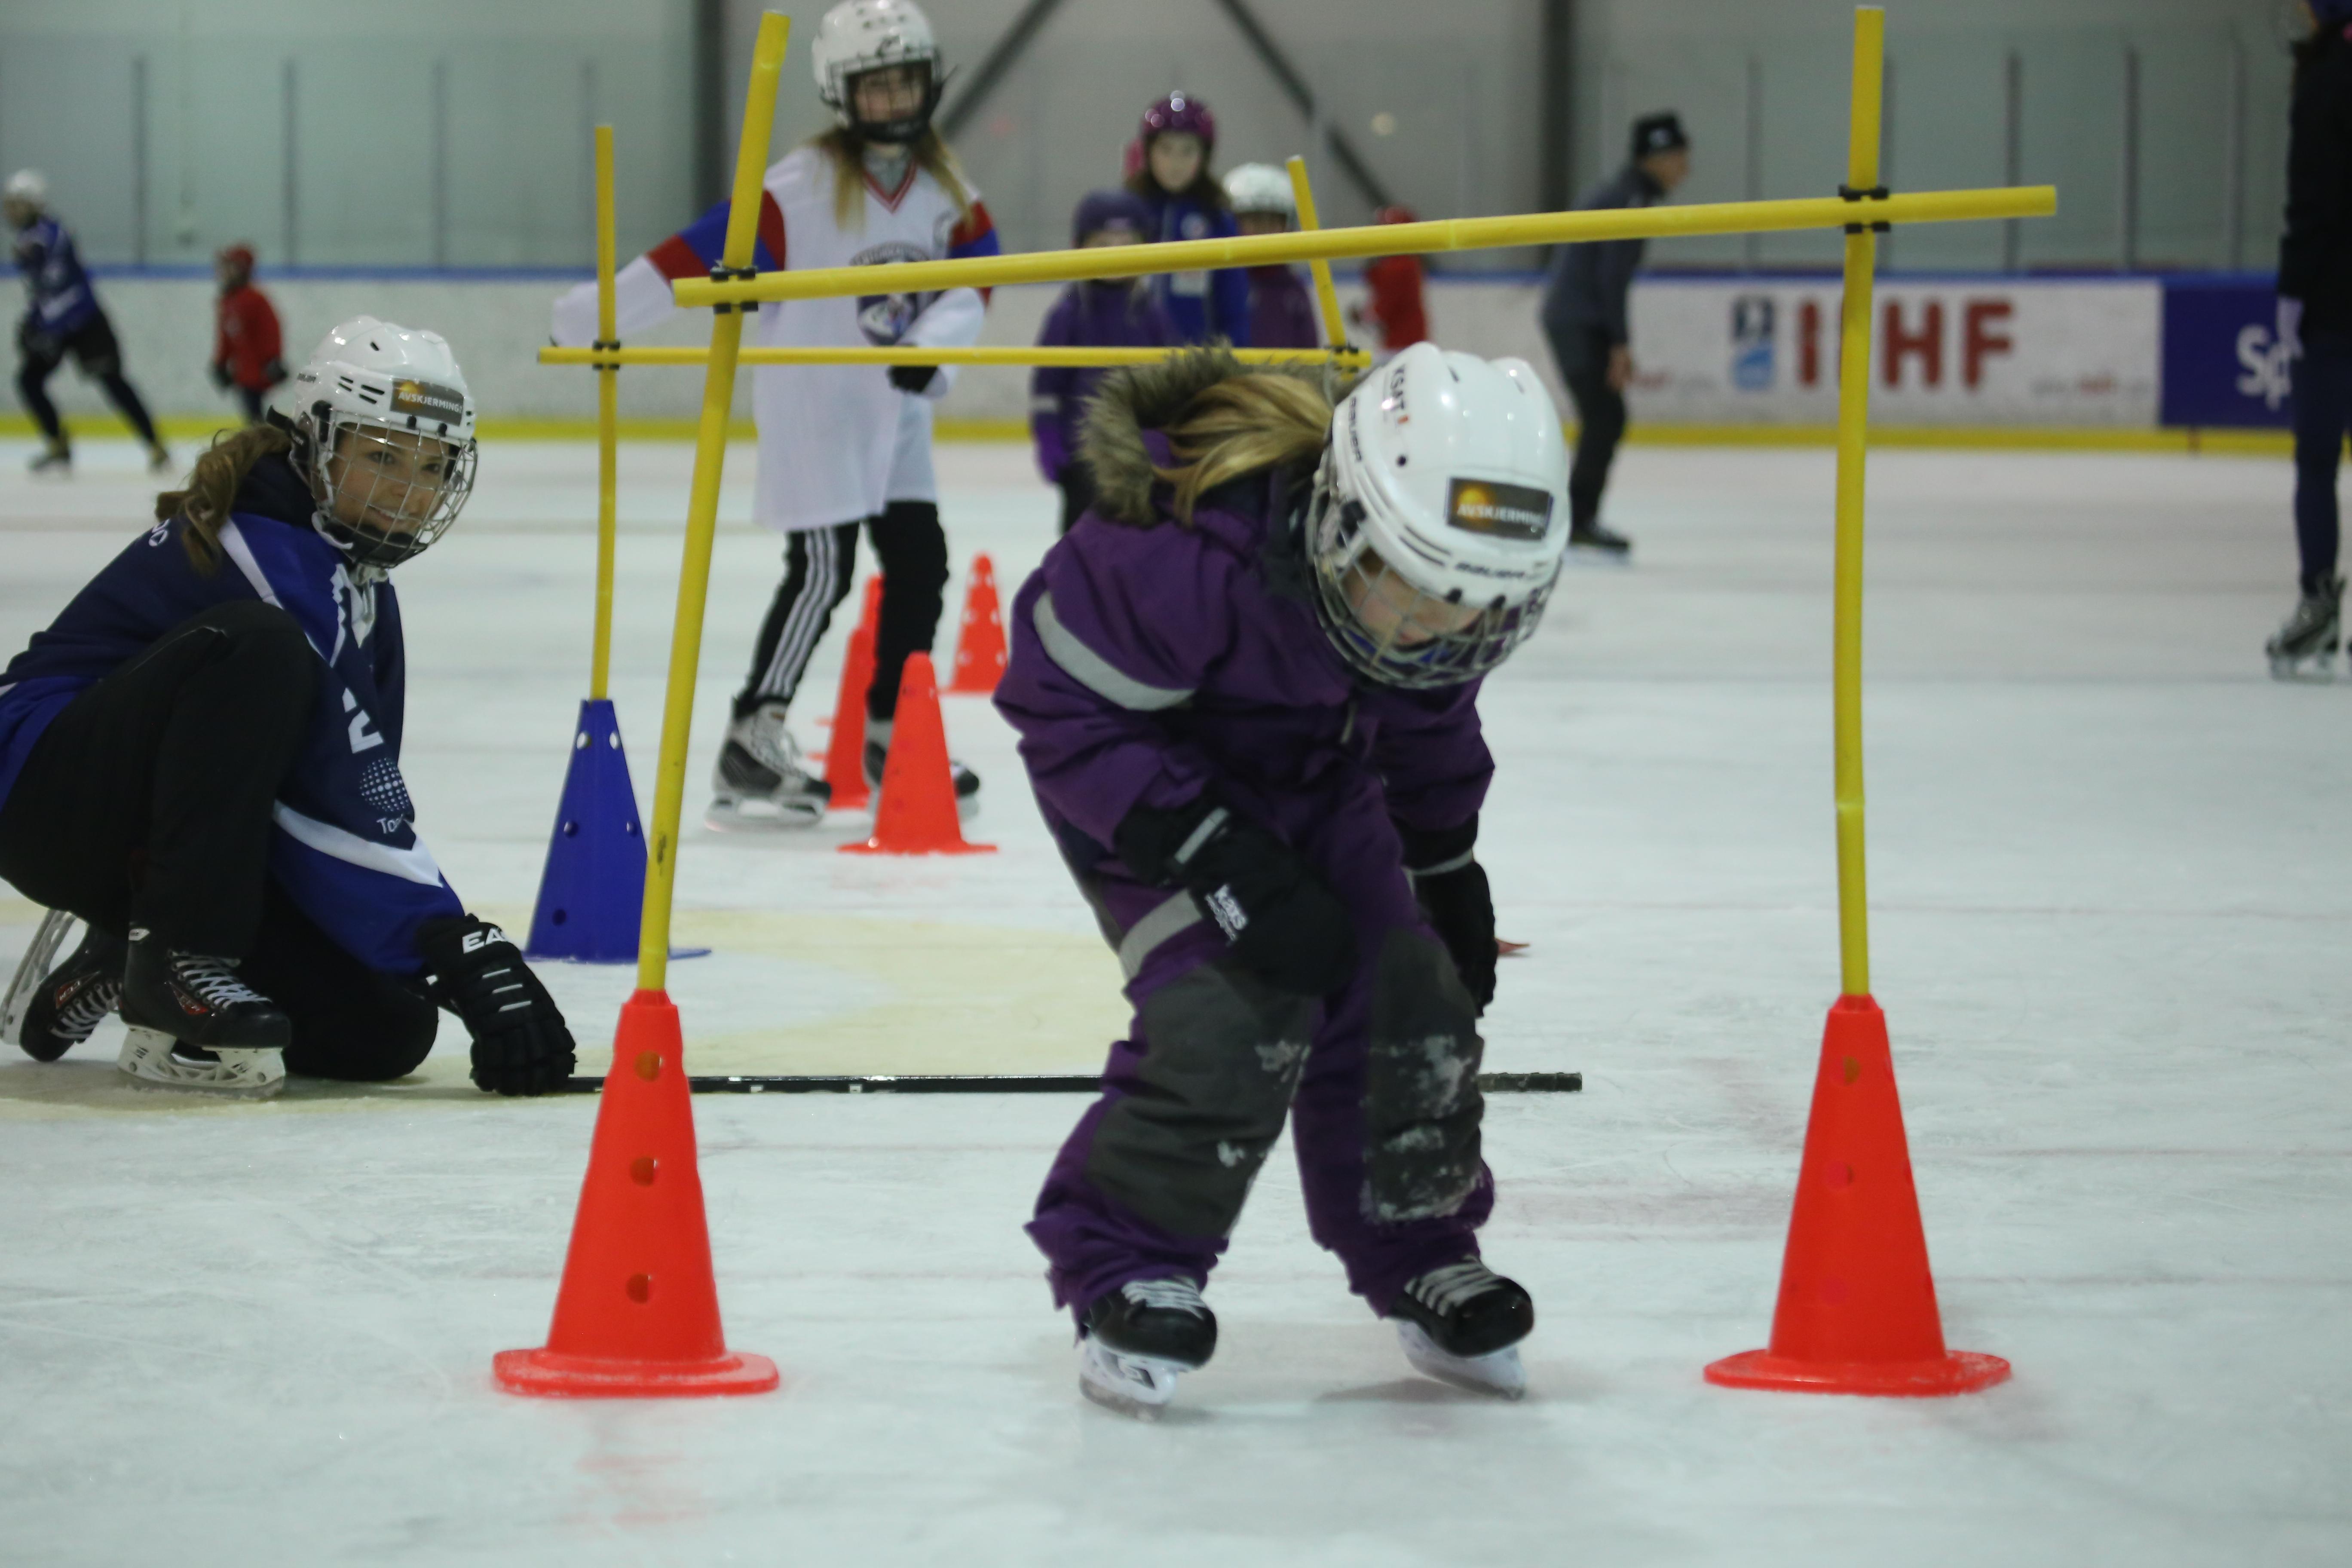 Jentehockey 1